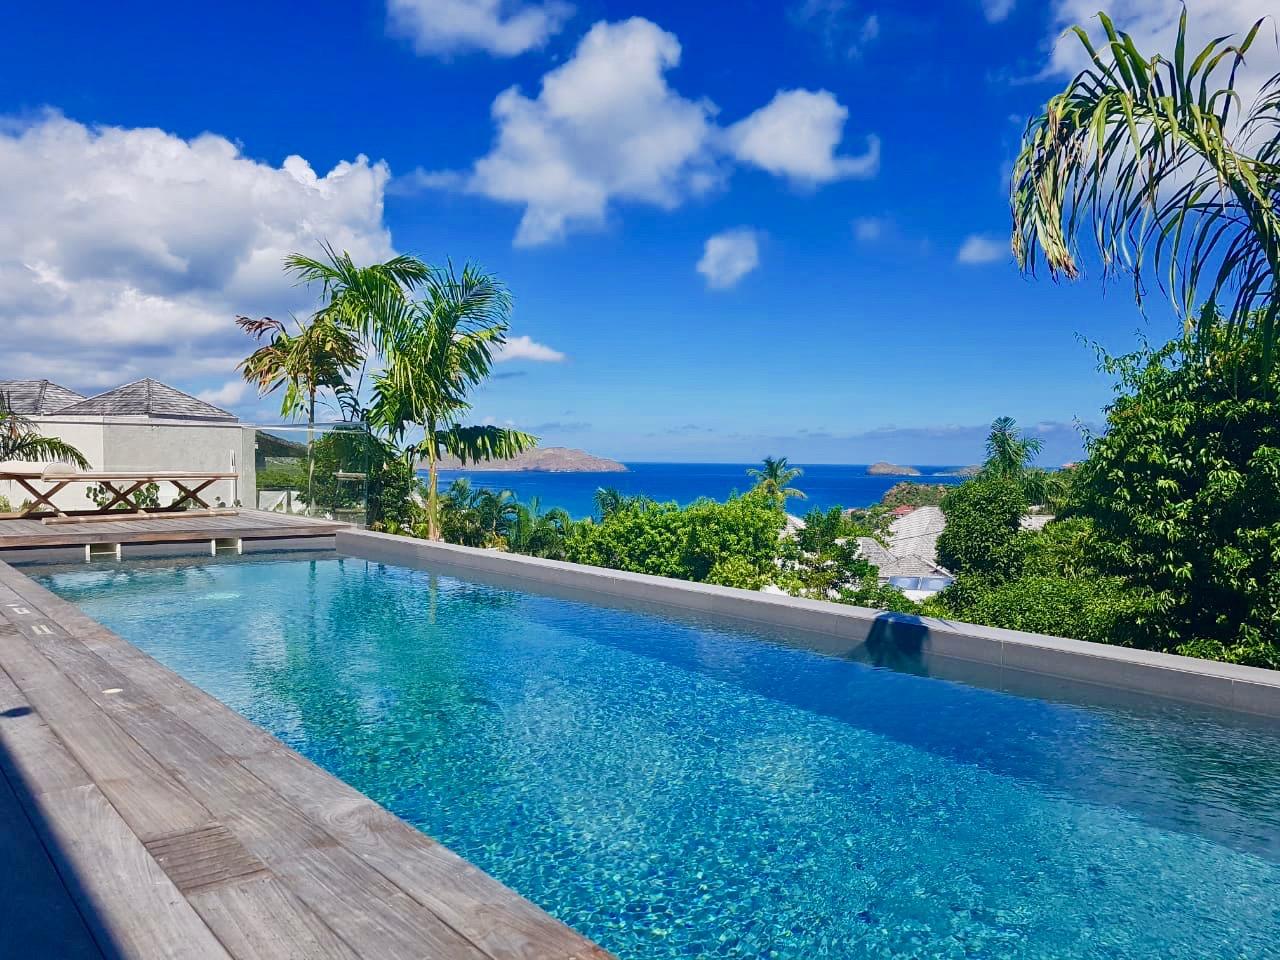 Villa Good Vibrations - Modern Villa Rental St Barth Fully Equipped - Swimming Pool